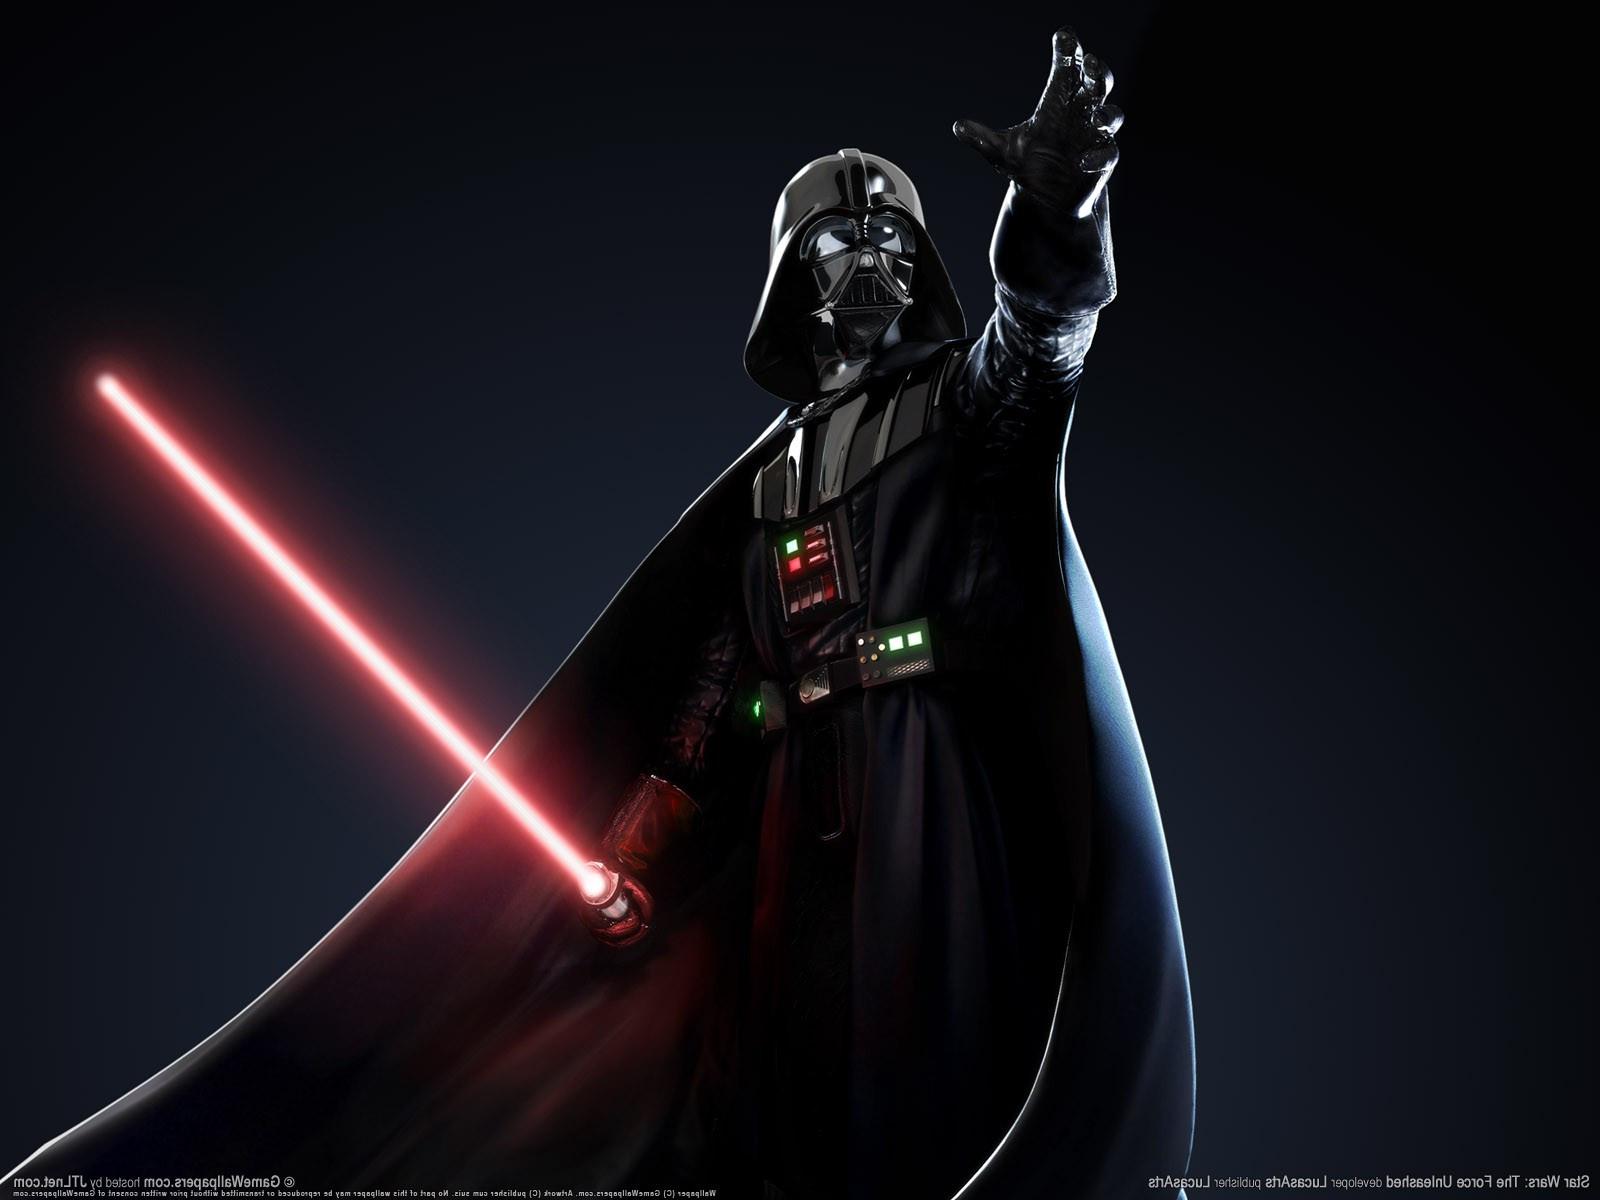 Wallpaper Star Wars Darth Vader Darkness 1600x1200 Px Computer Wallpaper 1600x1200 4kwallpaper 787233 Hd Wallpapers Wallhere